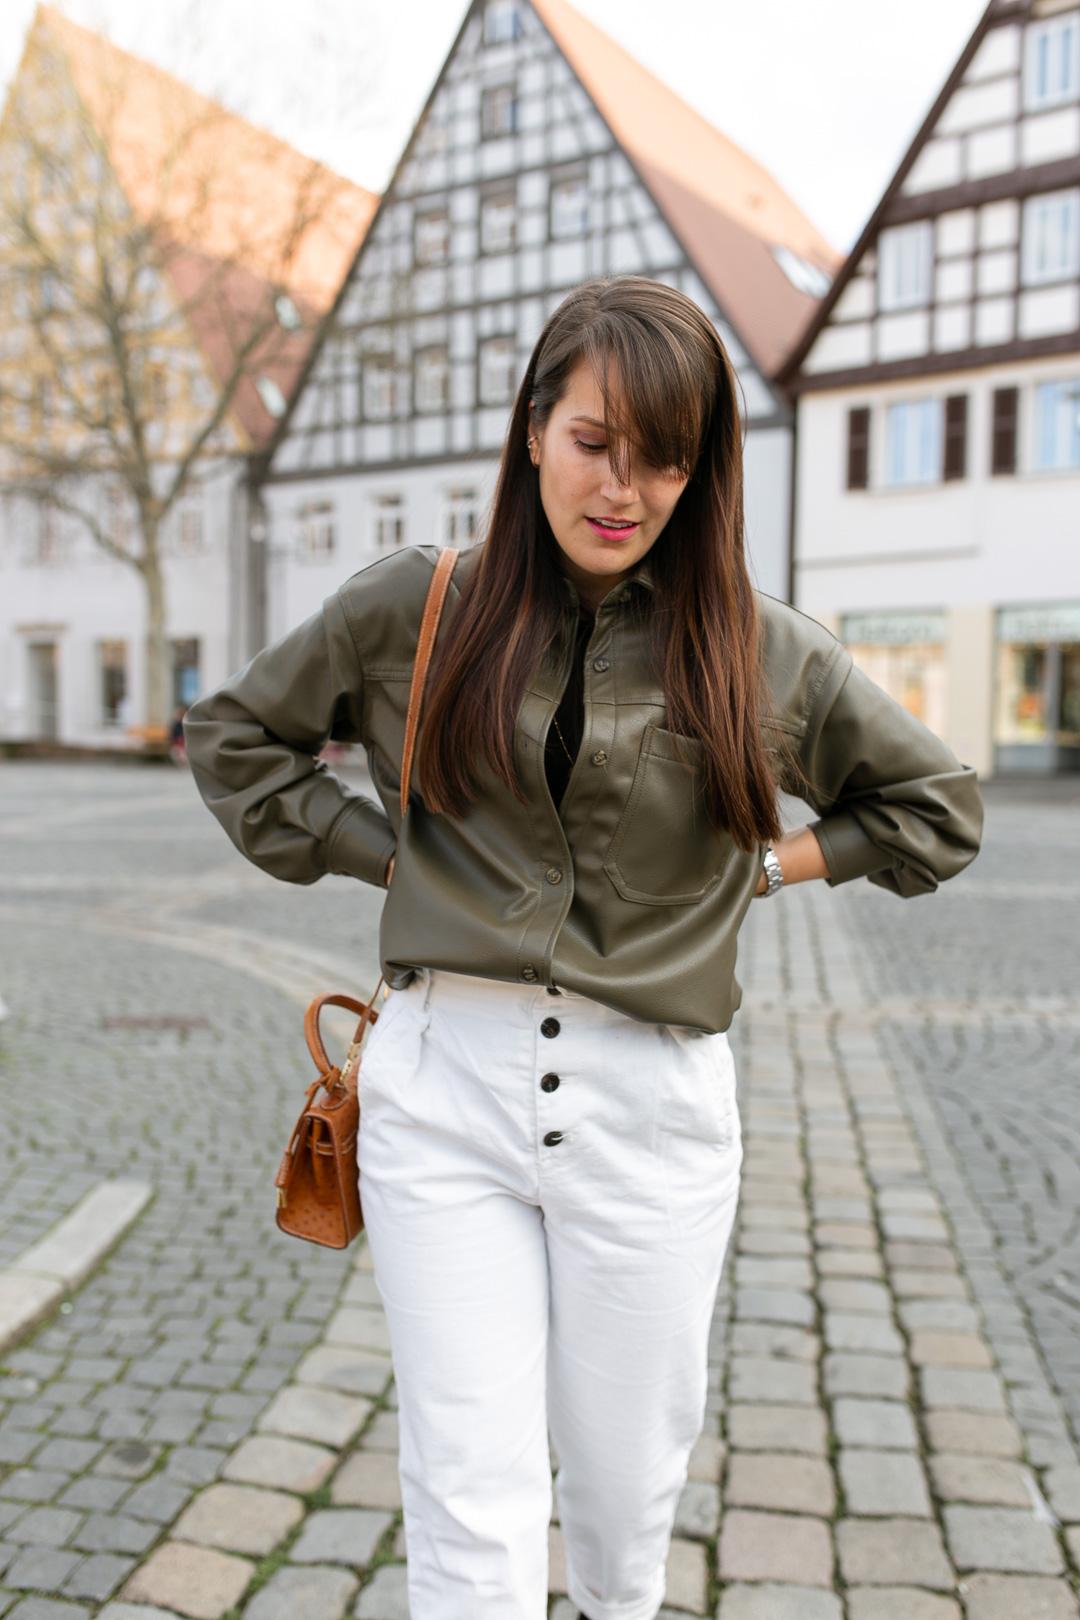 Trend Lederhemd - Pieces of Mariposa / Fashion & Lifestyle Blog aus Nürnberg